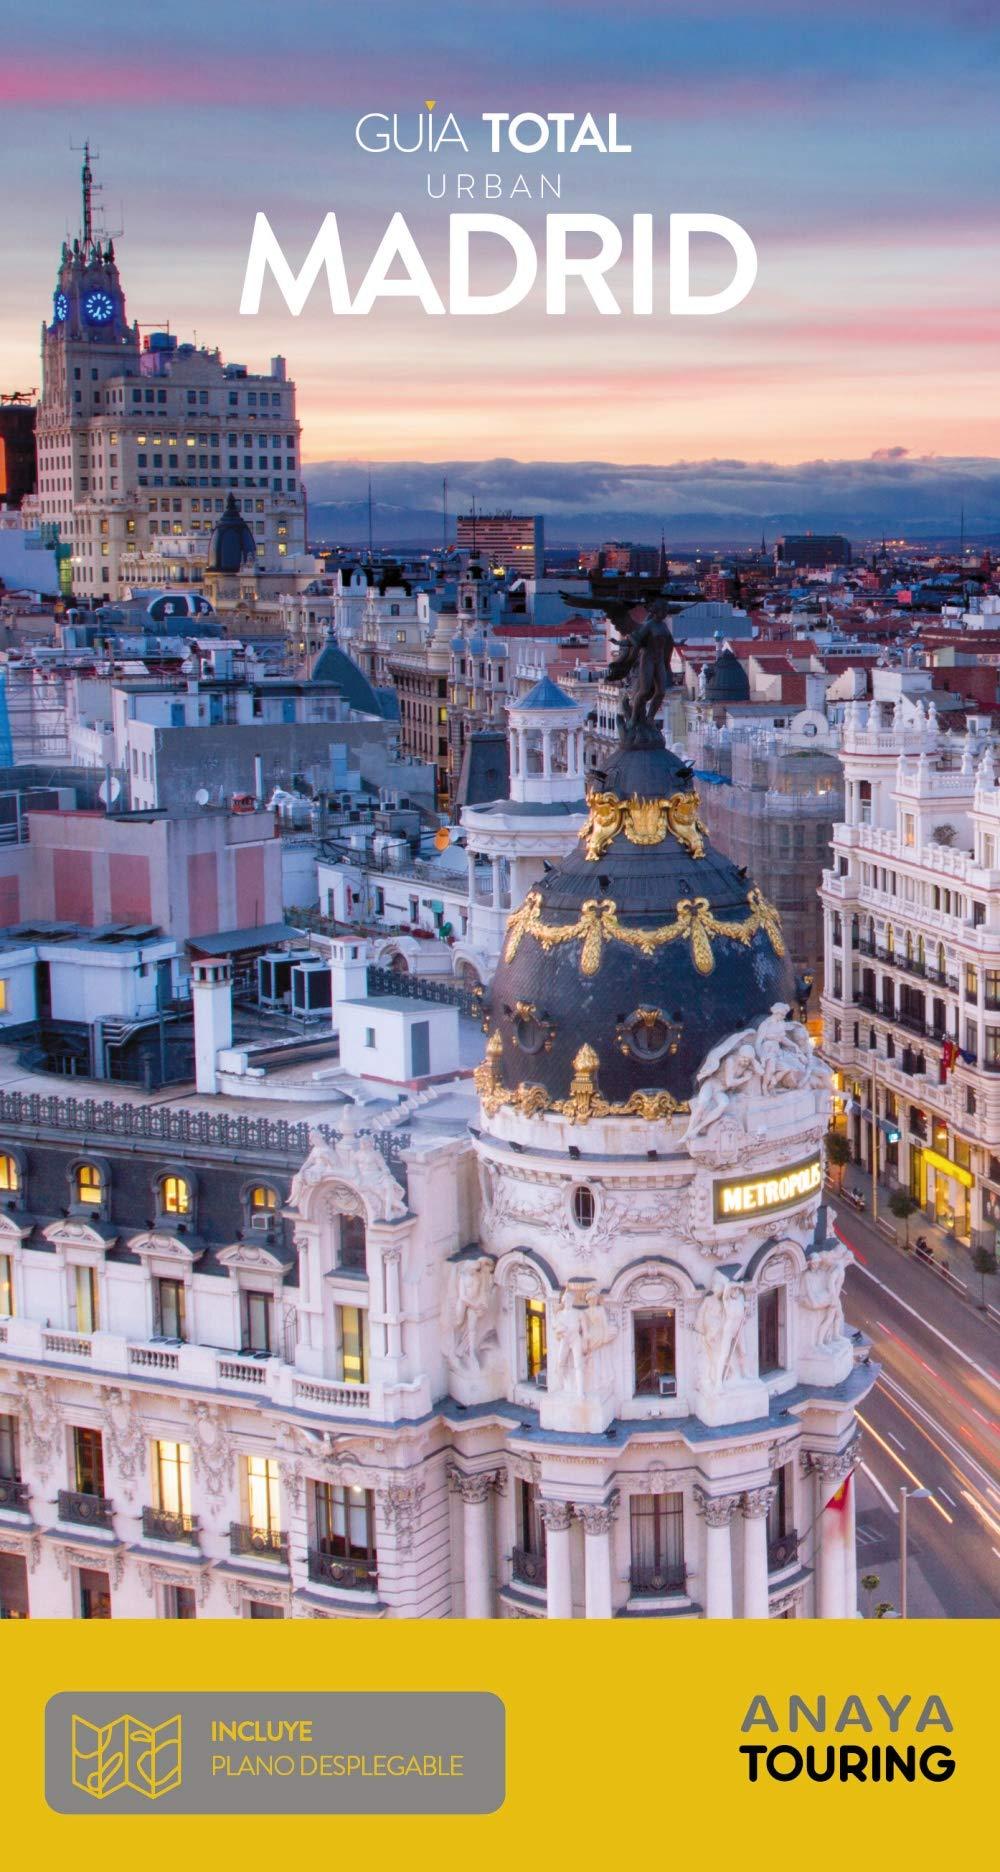 Madrid (Urban) (Guía Total - Urban - España): Amazon.es: Giles ...